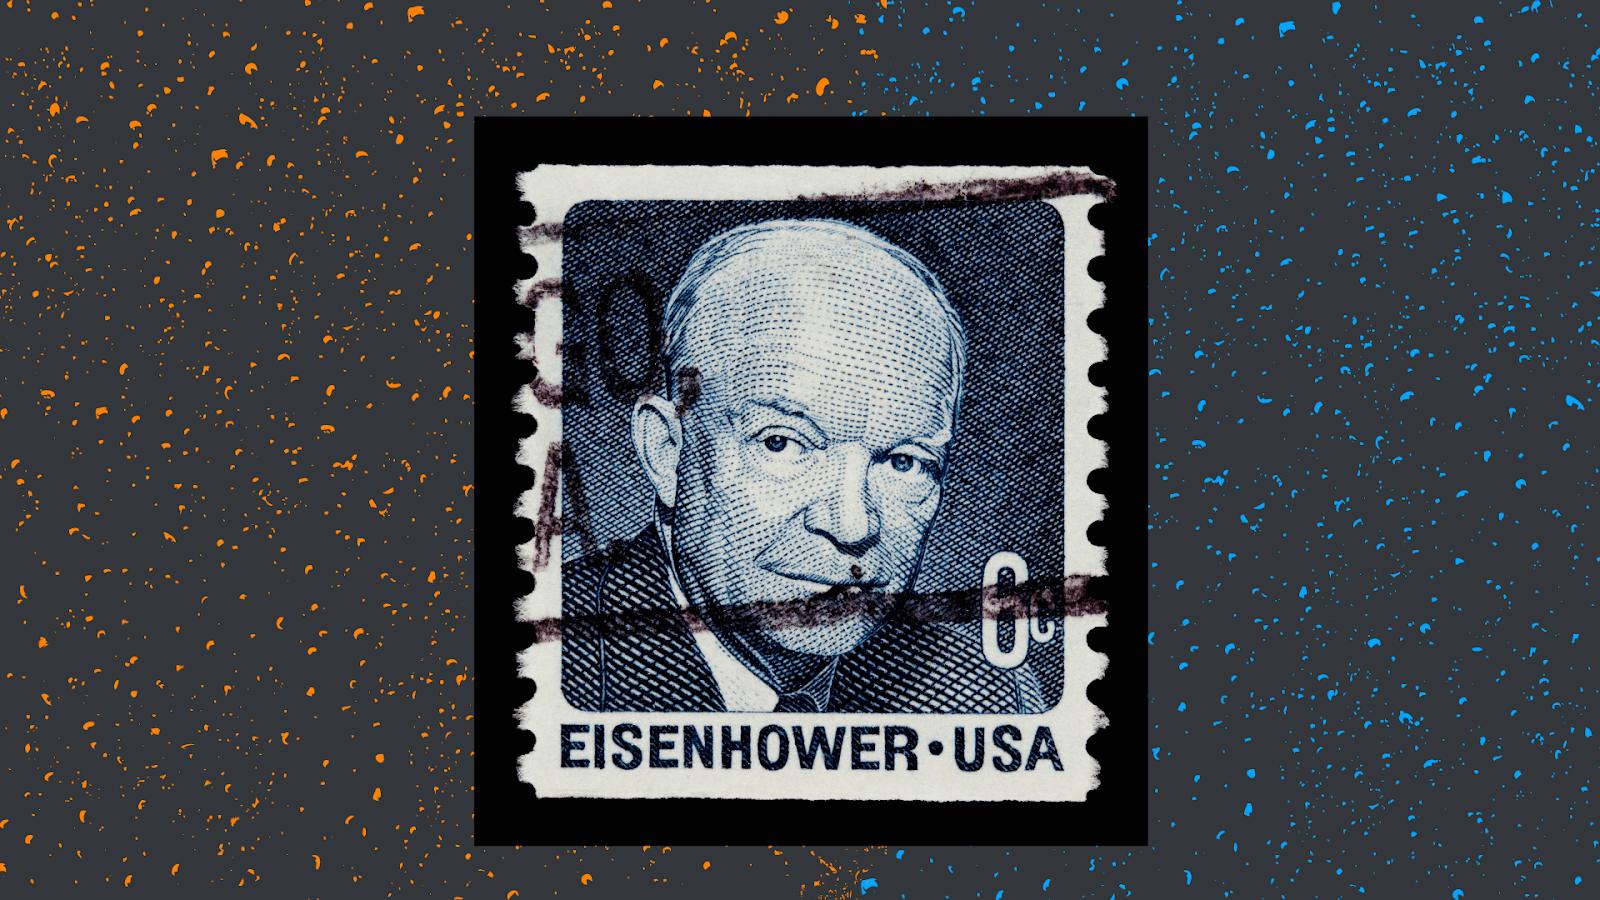 image of eisenhower, the creator of the productivity matrix